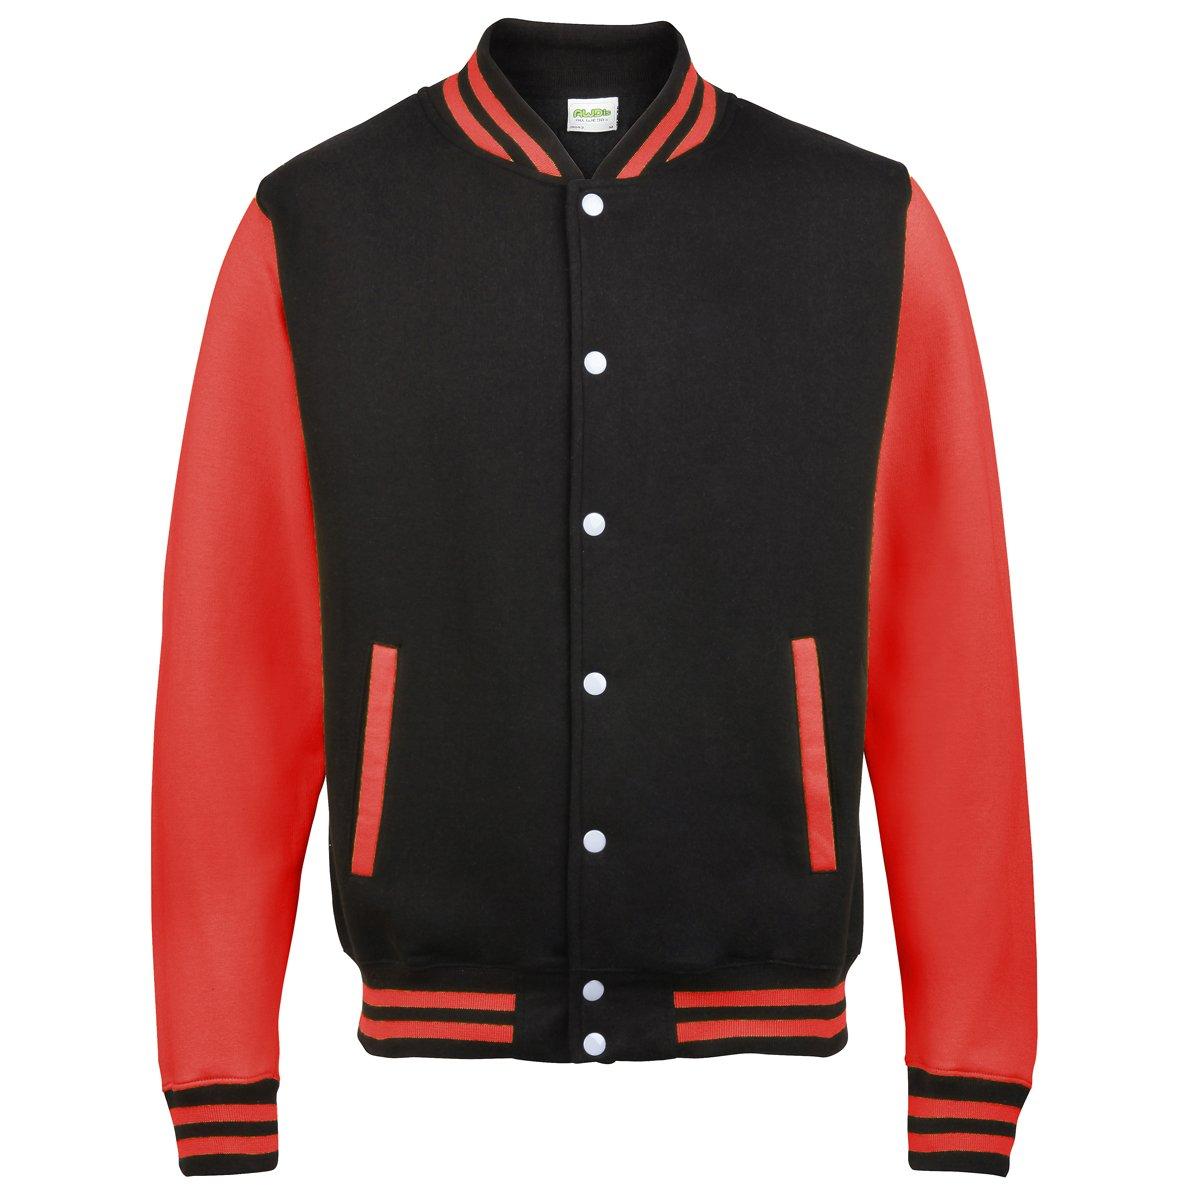 KiarenzaFD Varsity Jacket zweifarbiger Hoods Streetwear Sweatshirt Herren College Jacke schwarz rot